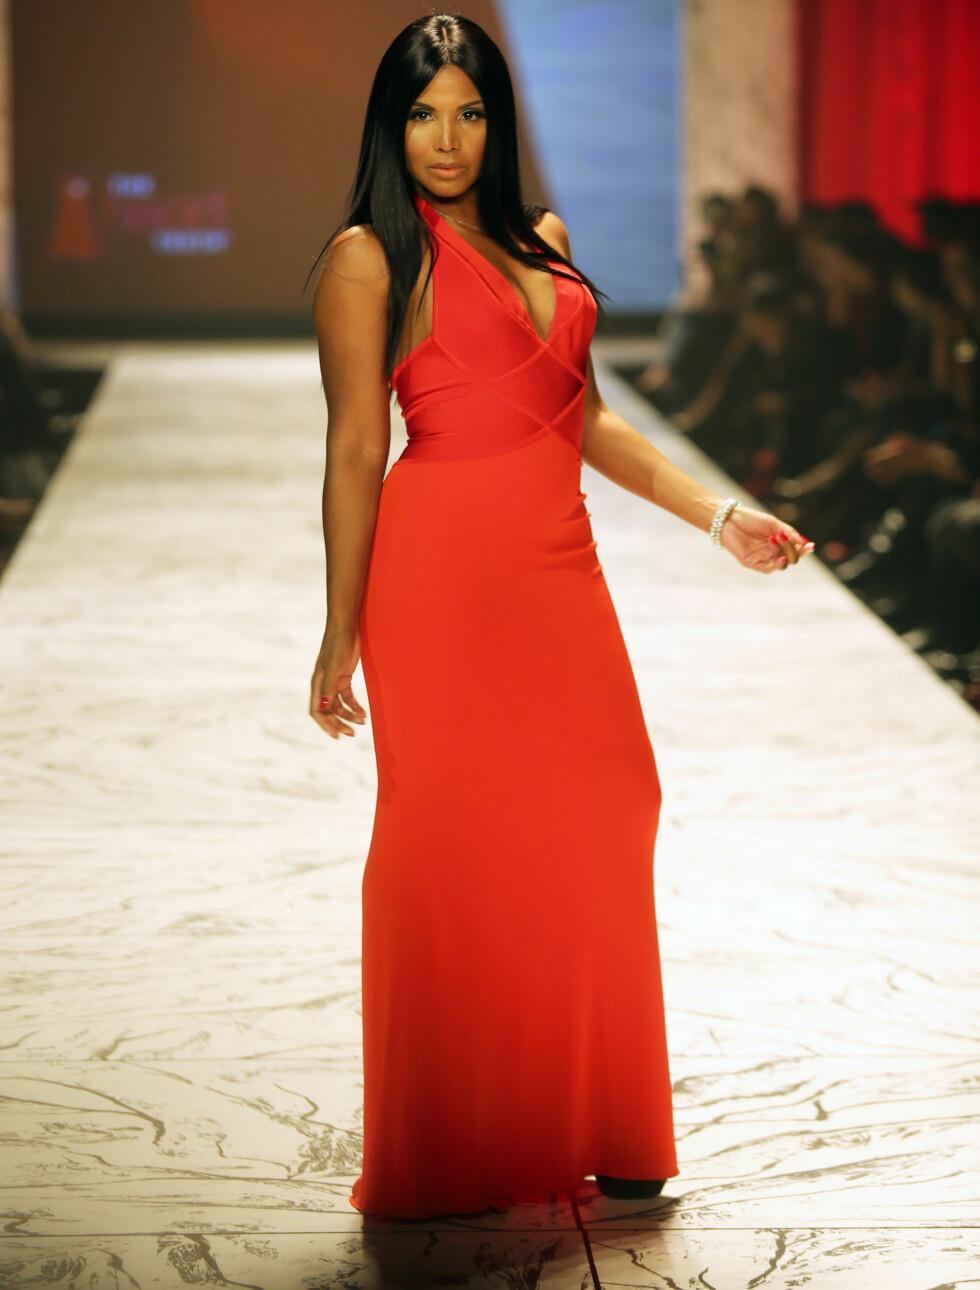 FORMFULL: Toni Braxton var flott i en kjole fra Herve L. Leroux i en spennende oransjerød farge.  Foto: All Over Press